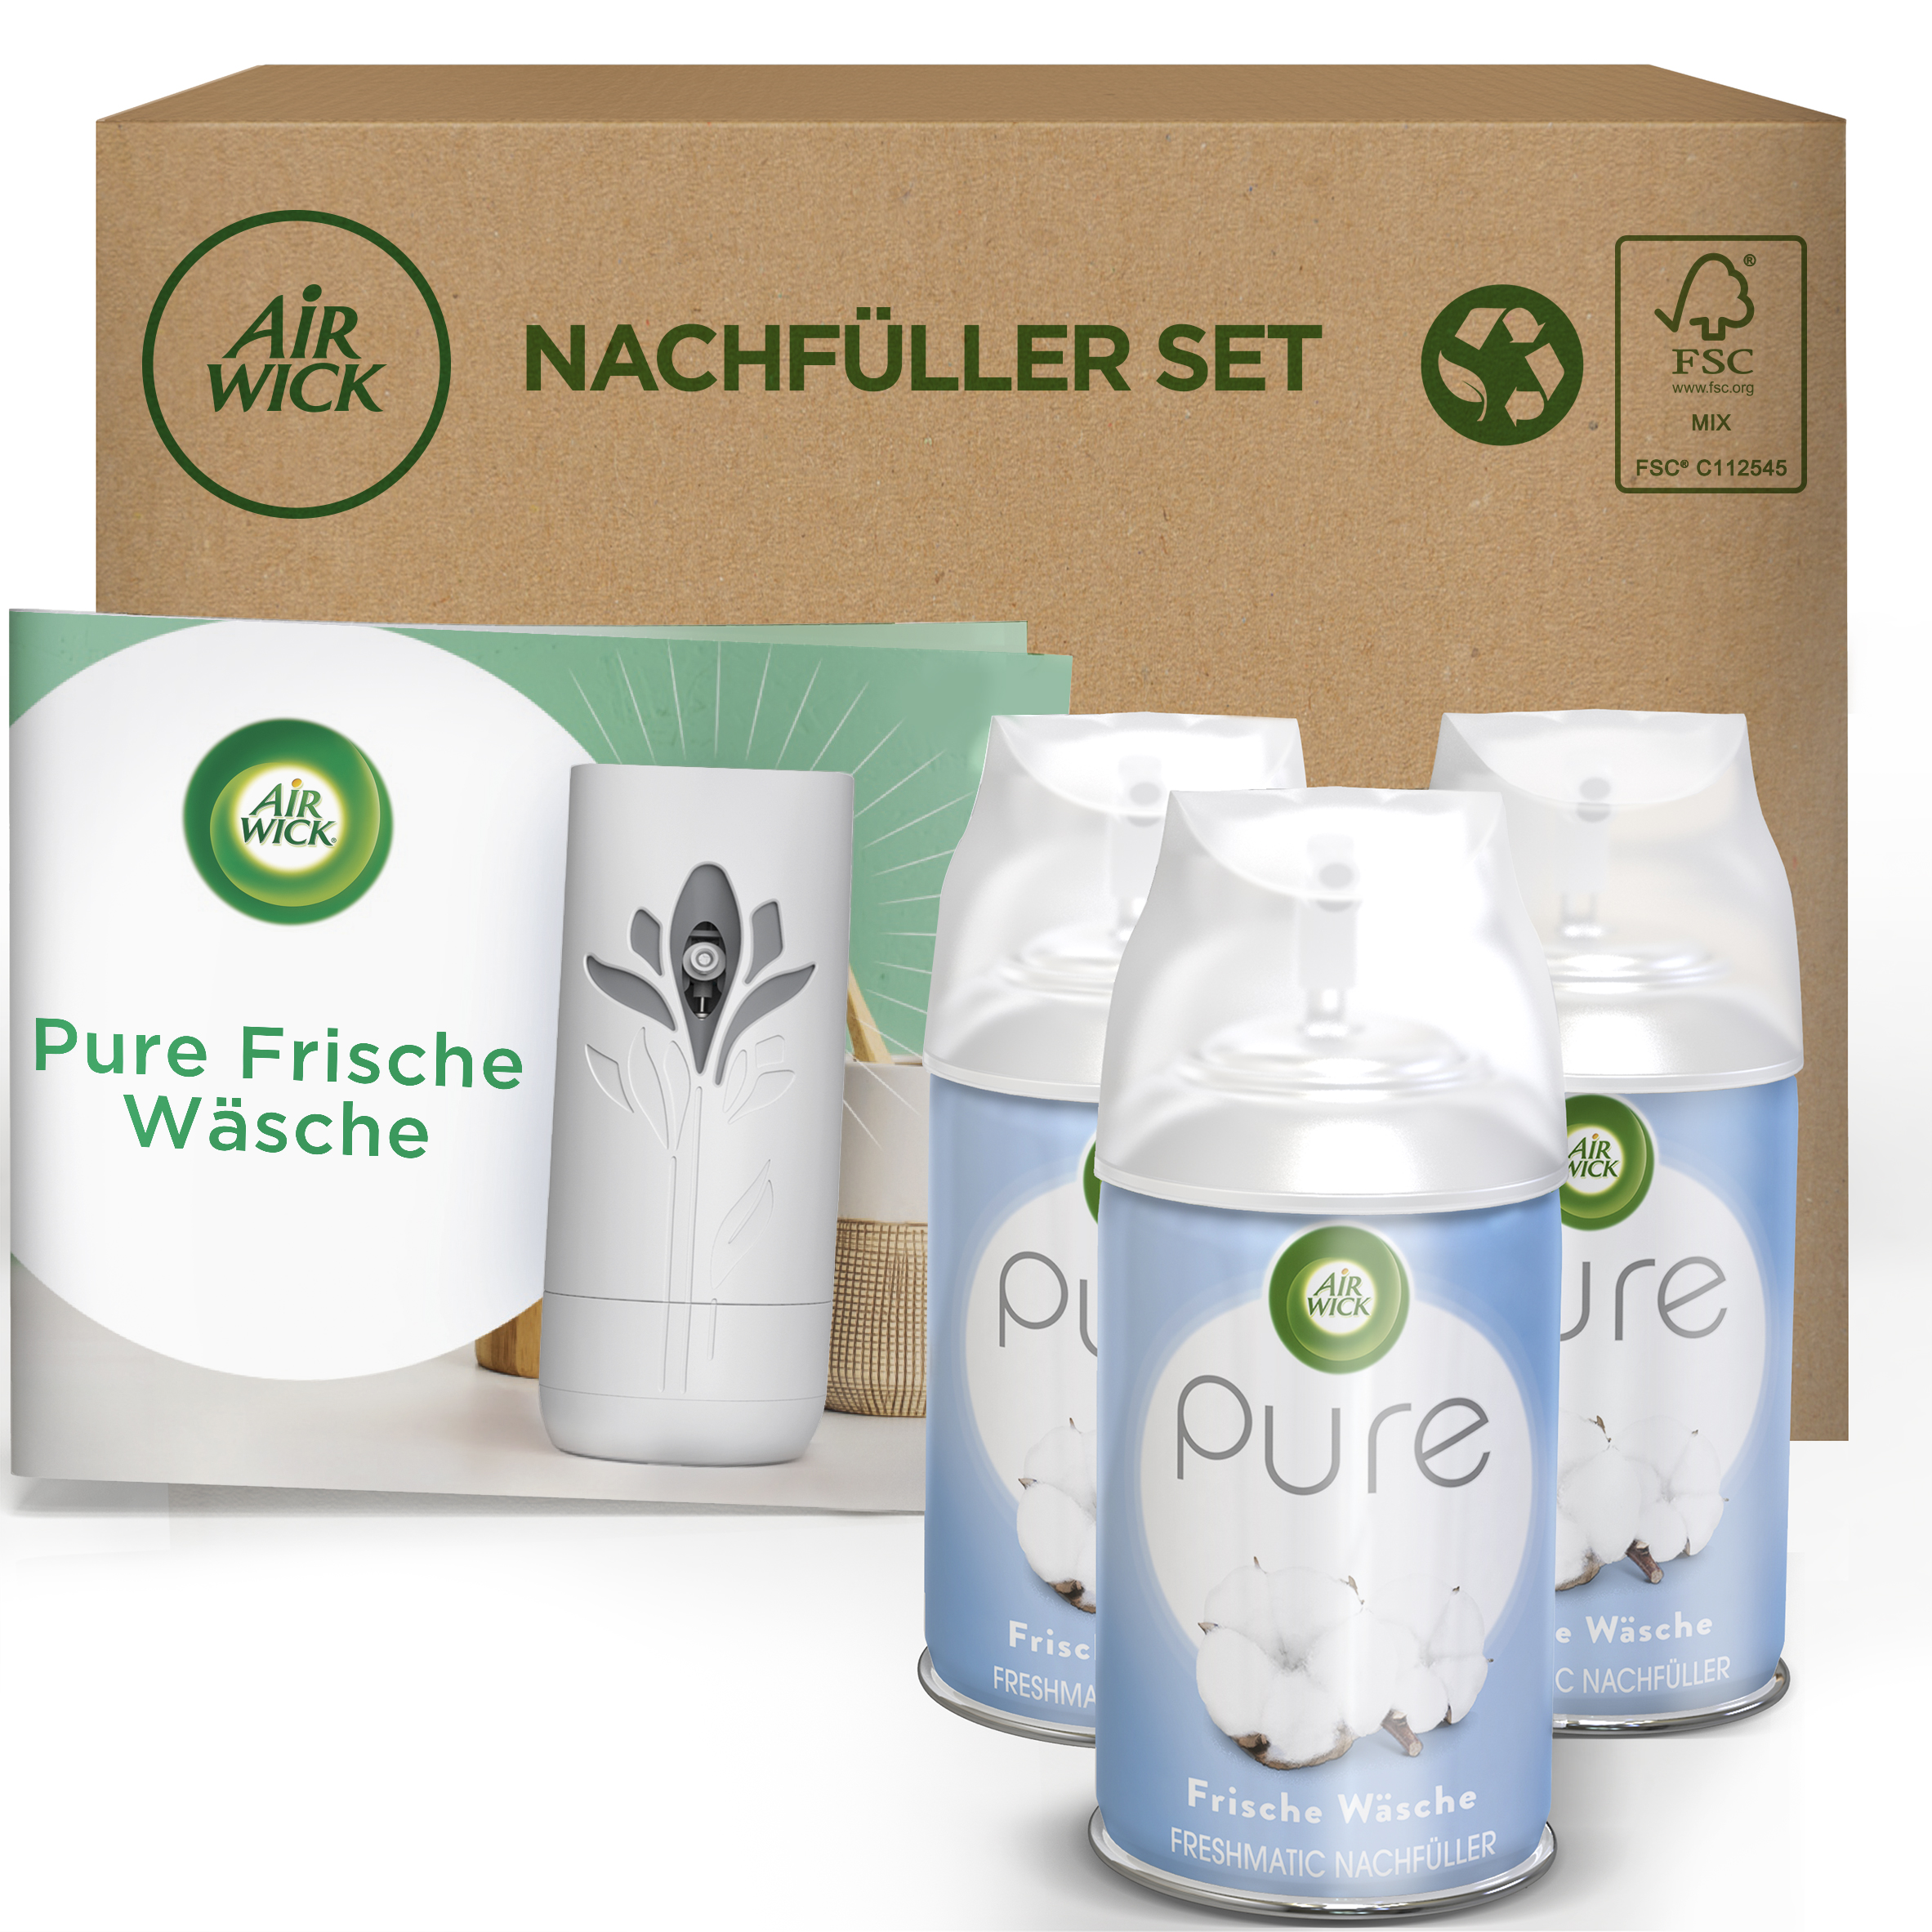 Air Wick Freshmatic Max eCom Nachfüller-Set PURE Frische Wäsche